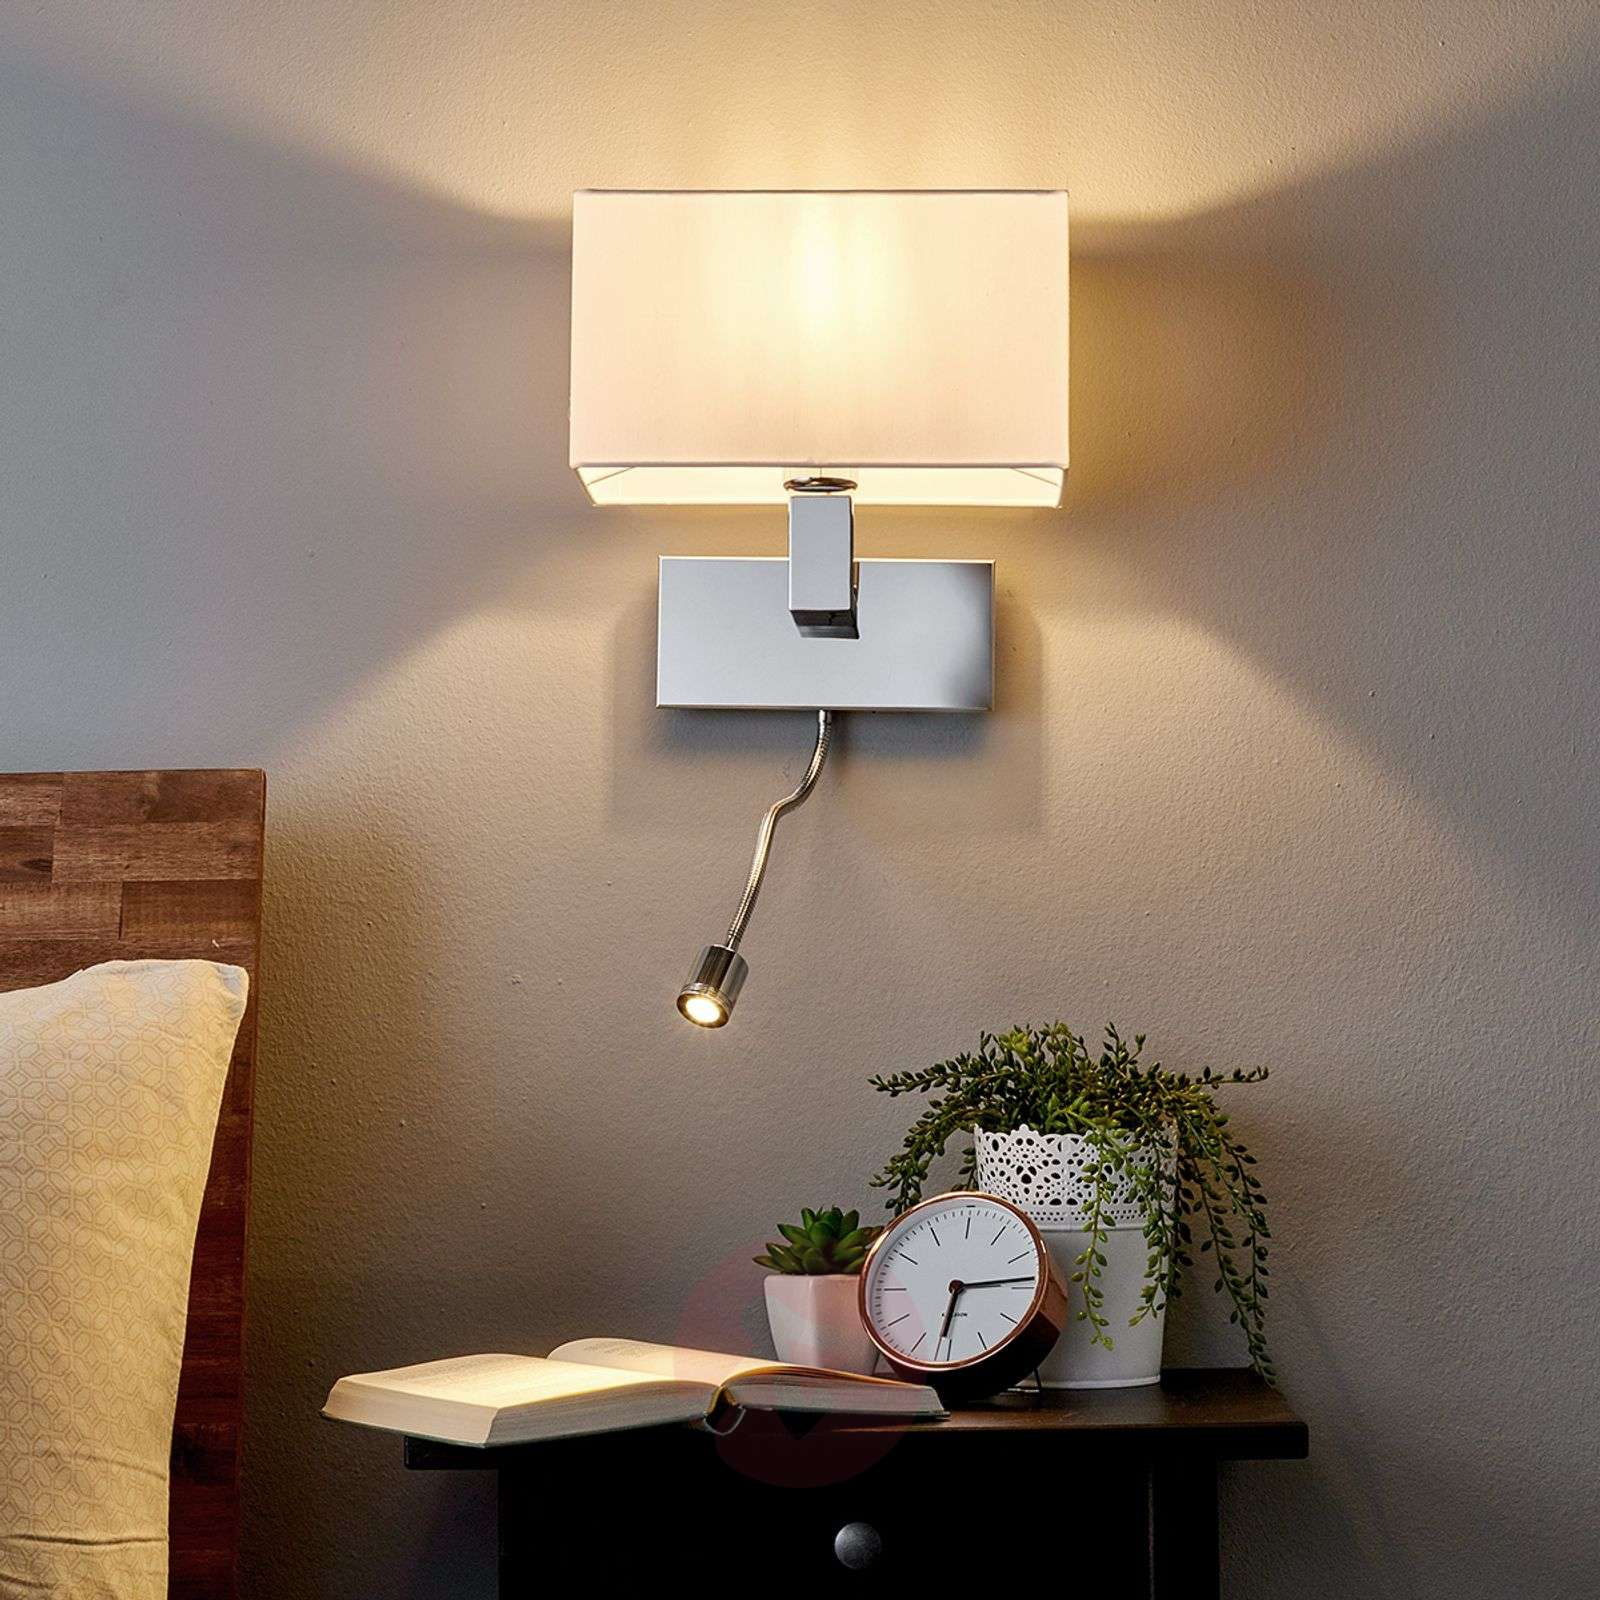 Wall light Tamara with fabric shade, LED flex arm_9976011_1